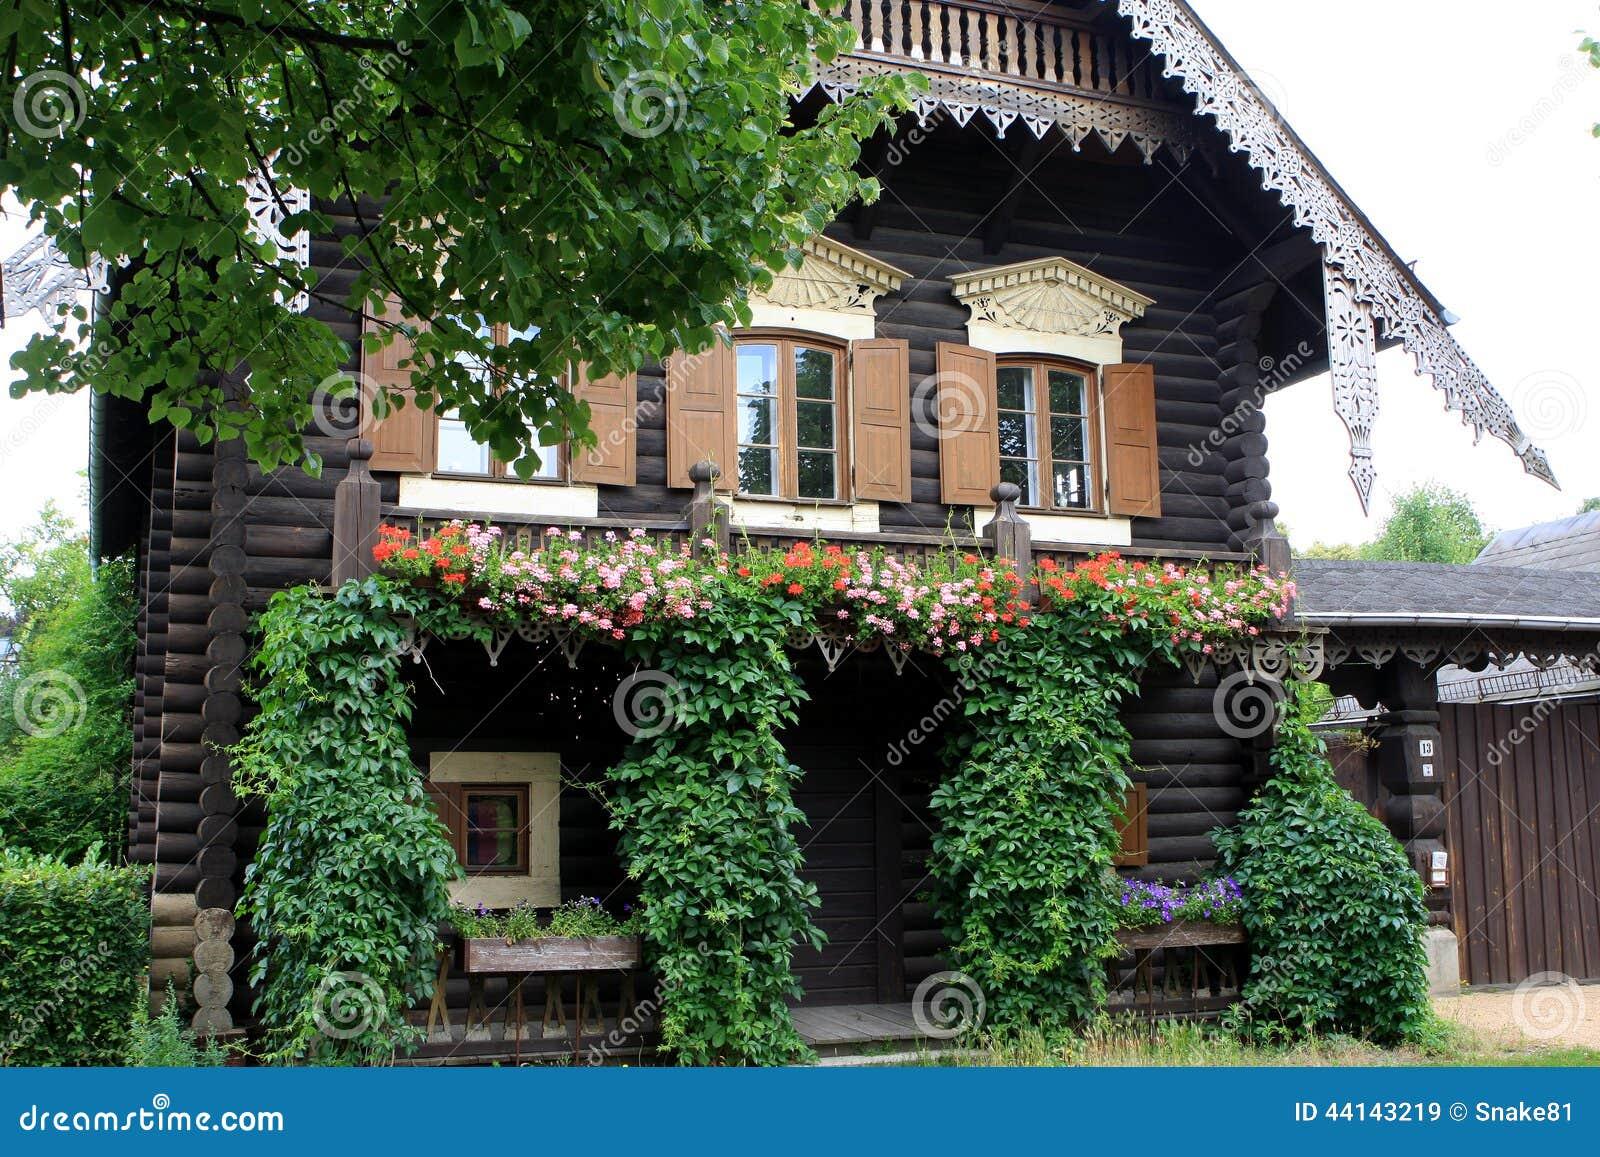 die russische kolonie alexandrowka potsdam stockfoto bild 44143219. Black Bedroom Furniture Sets. Home Design Ideas